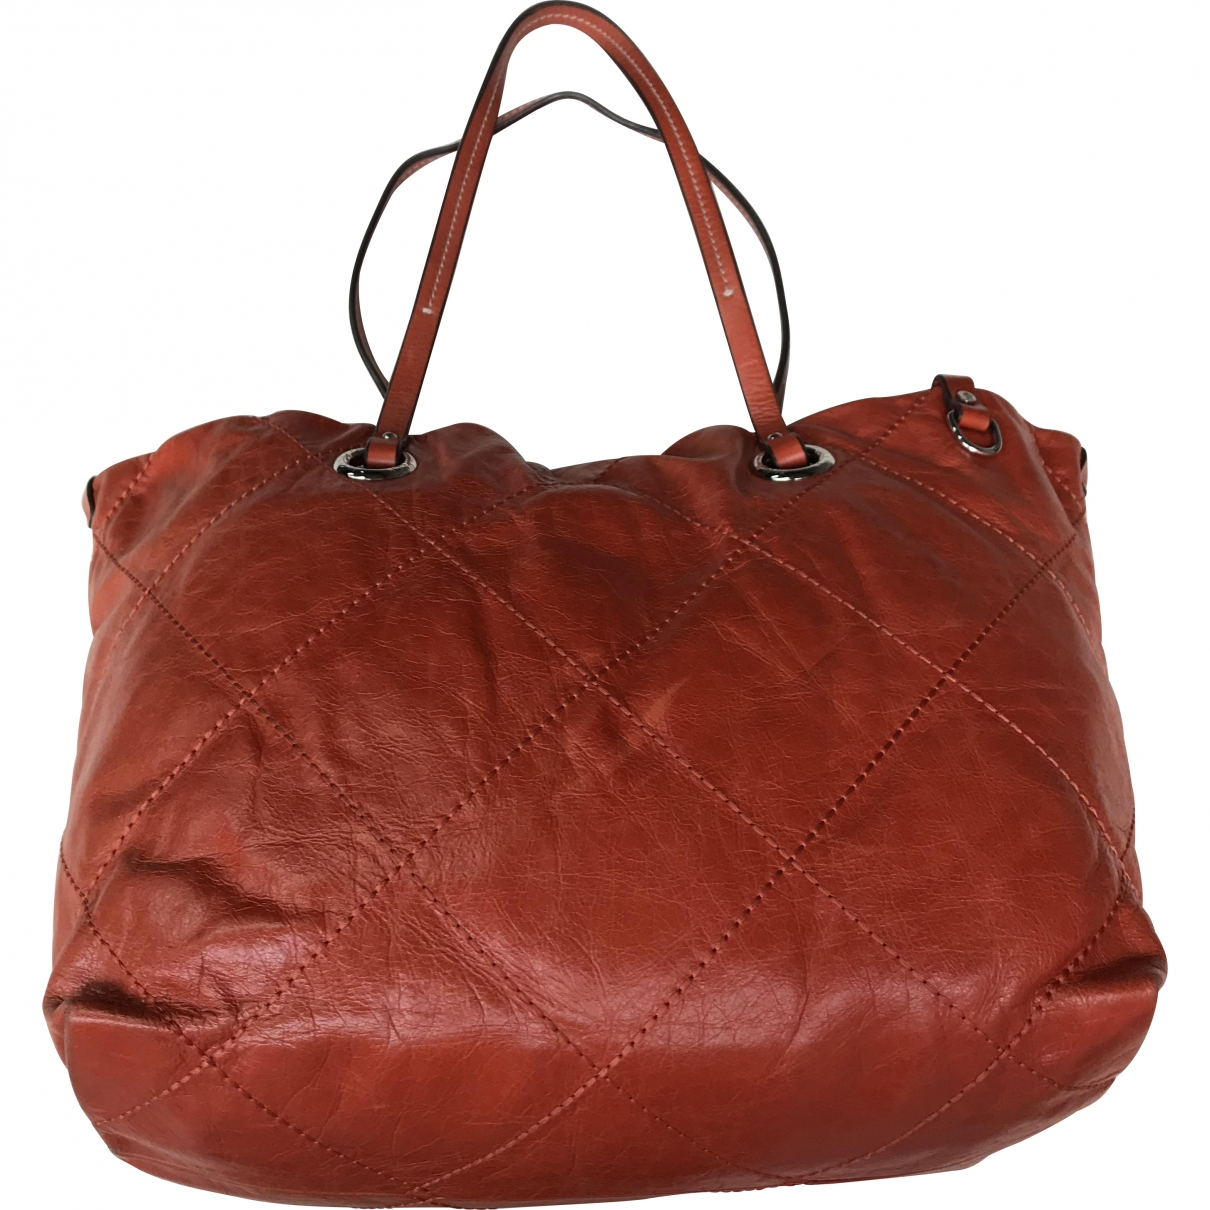 Moncler \N Orange Leather handbag for Women \N